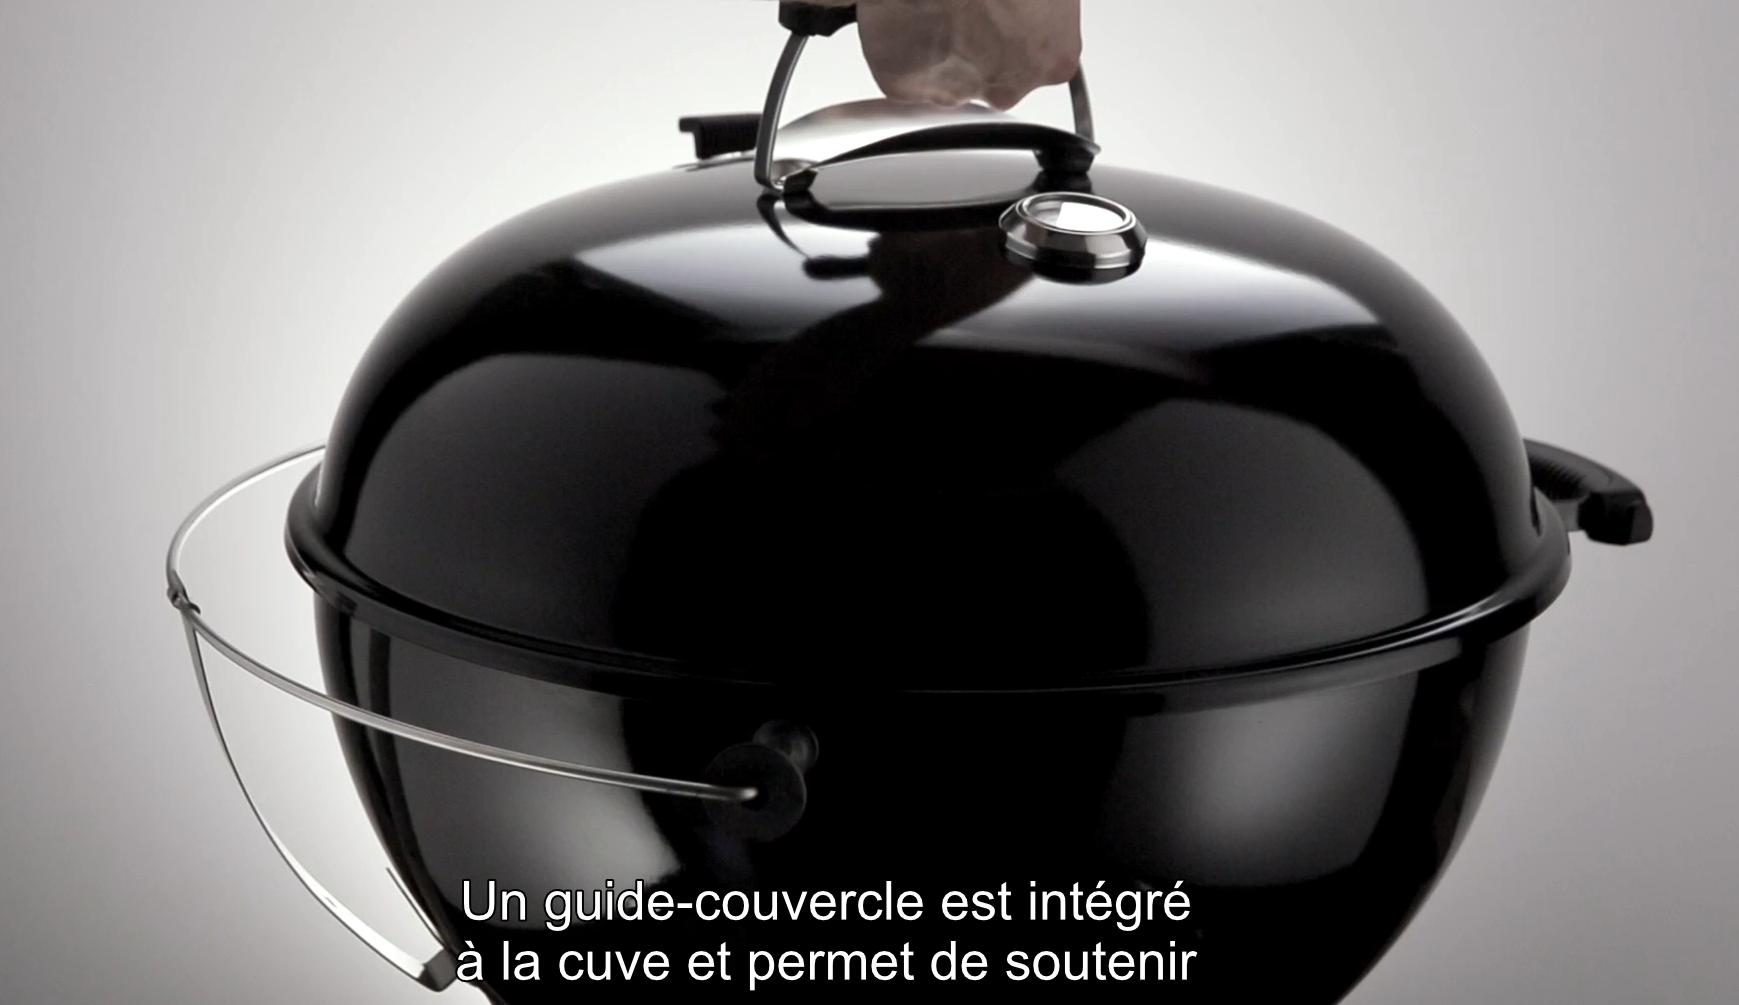 Video subtitling for barbeque giant, Weber